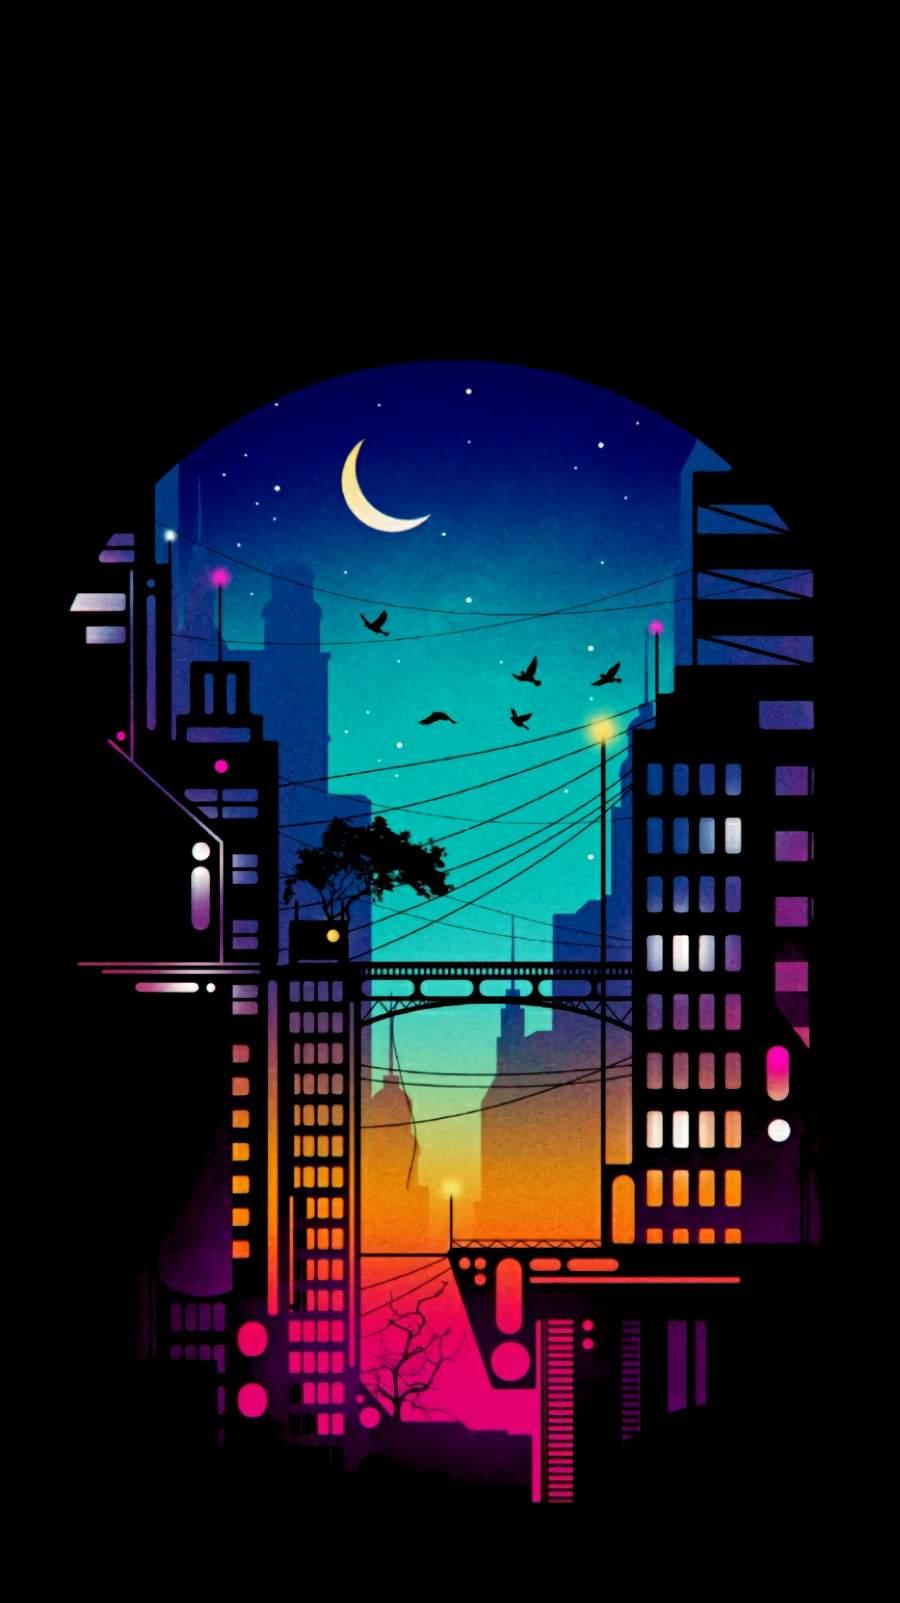 City at Night iPhone Wallpaper